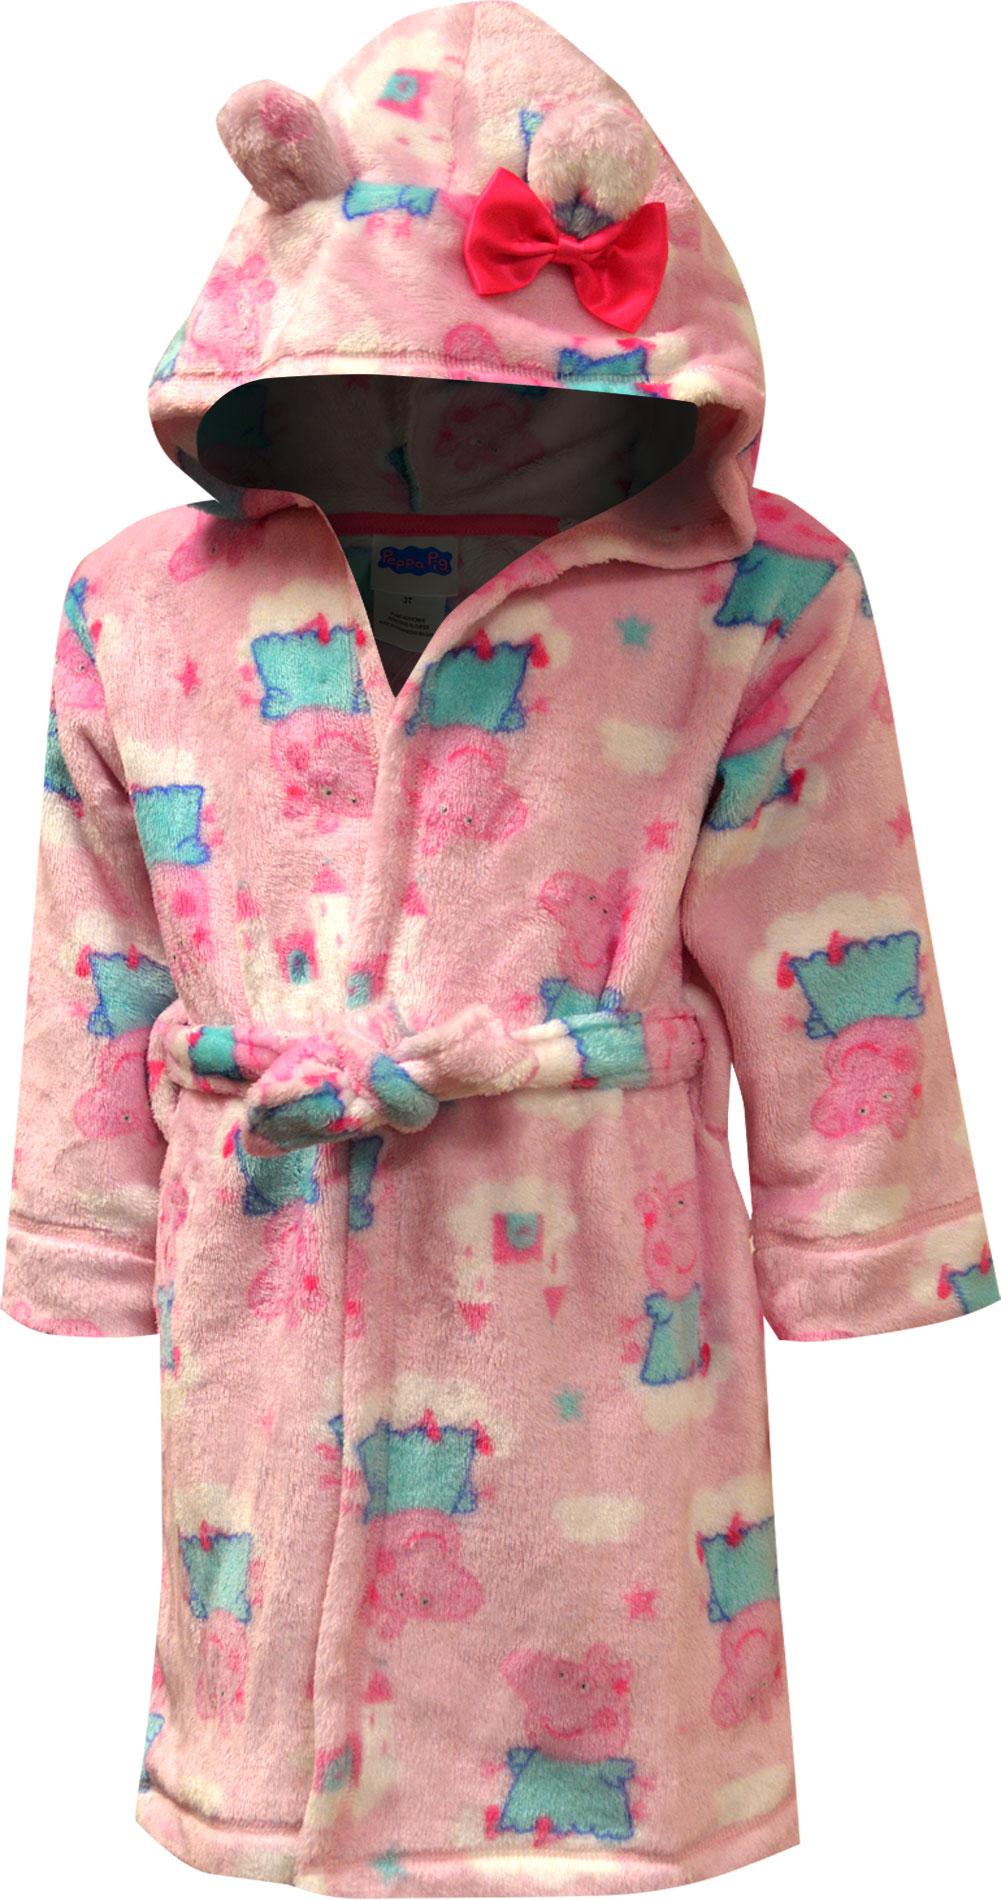 Image of Peppa Pig Pink Hooded Plush Toddler Robe for girls